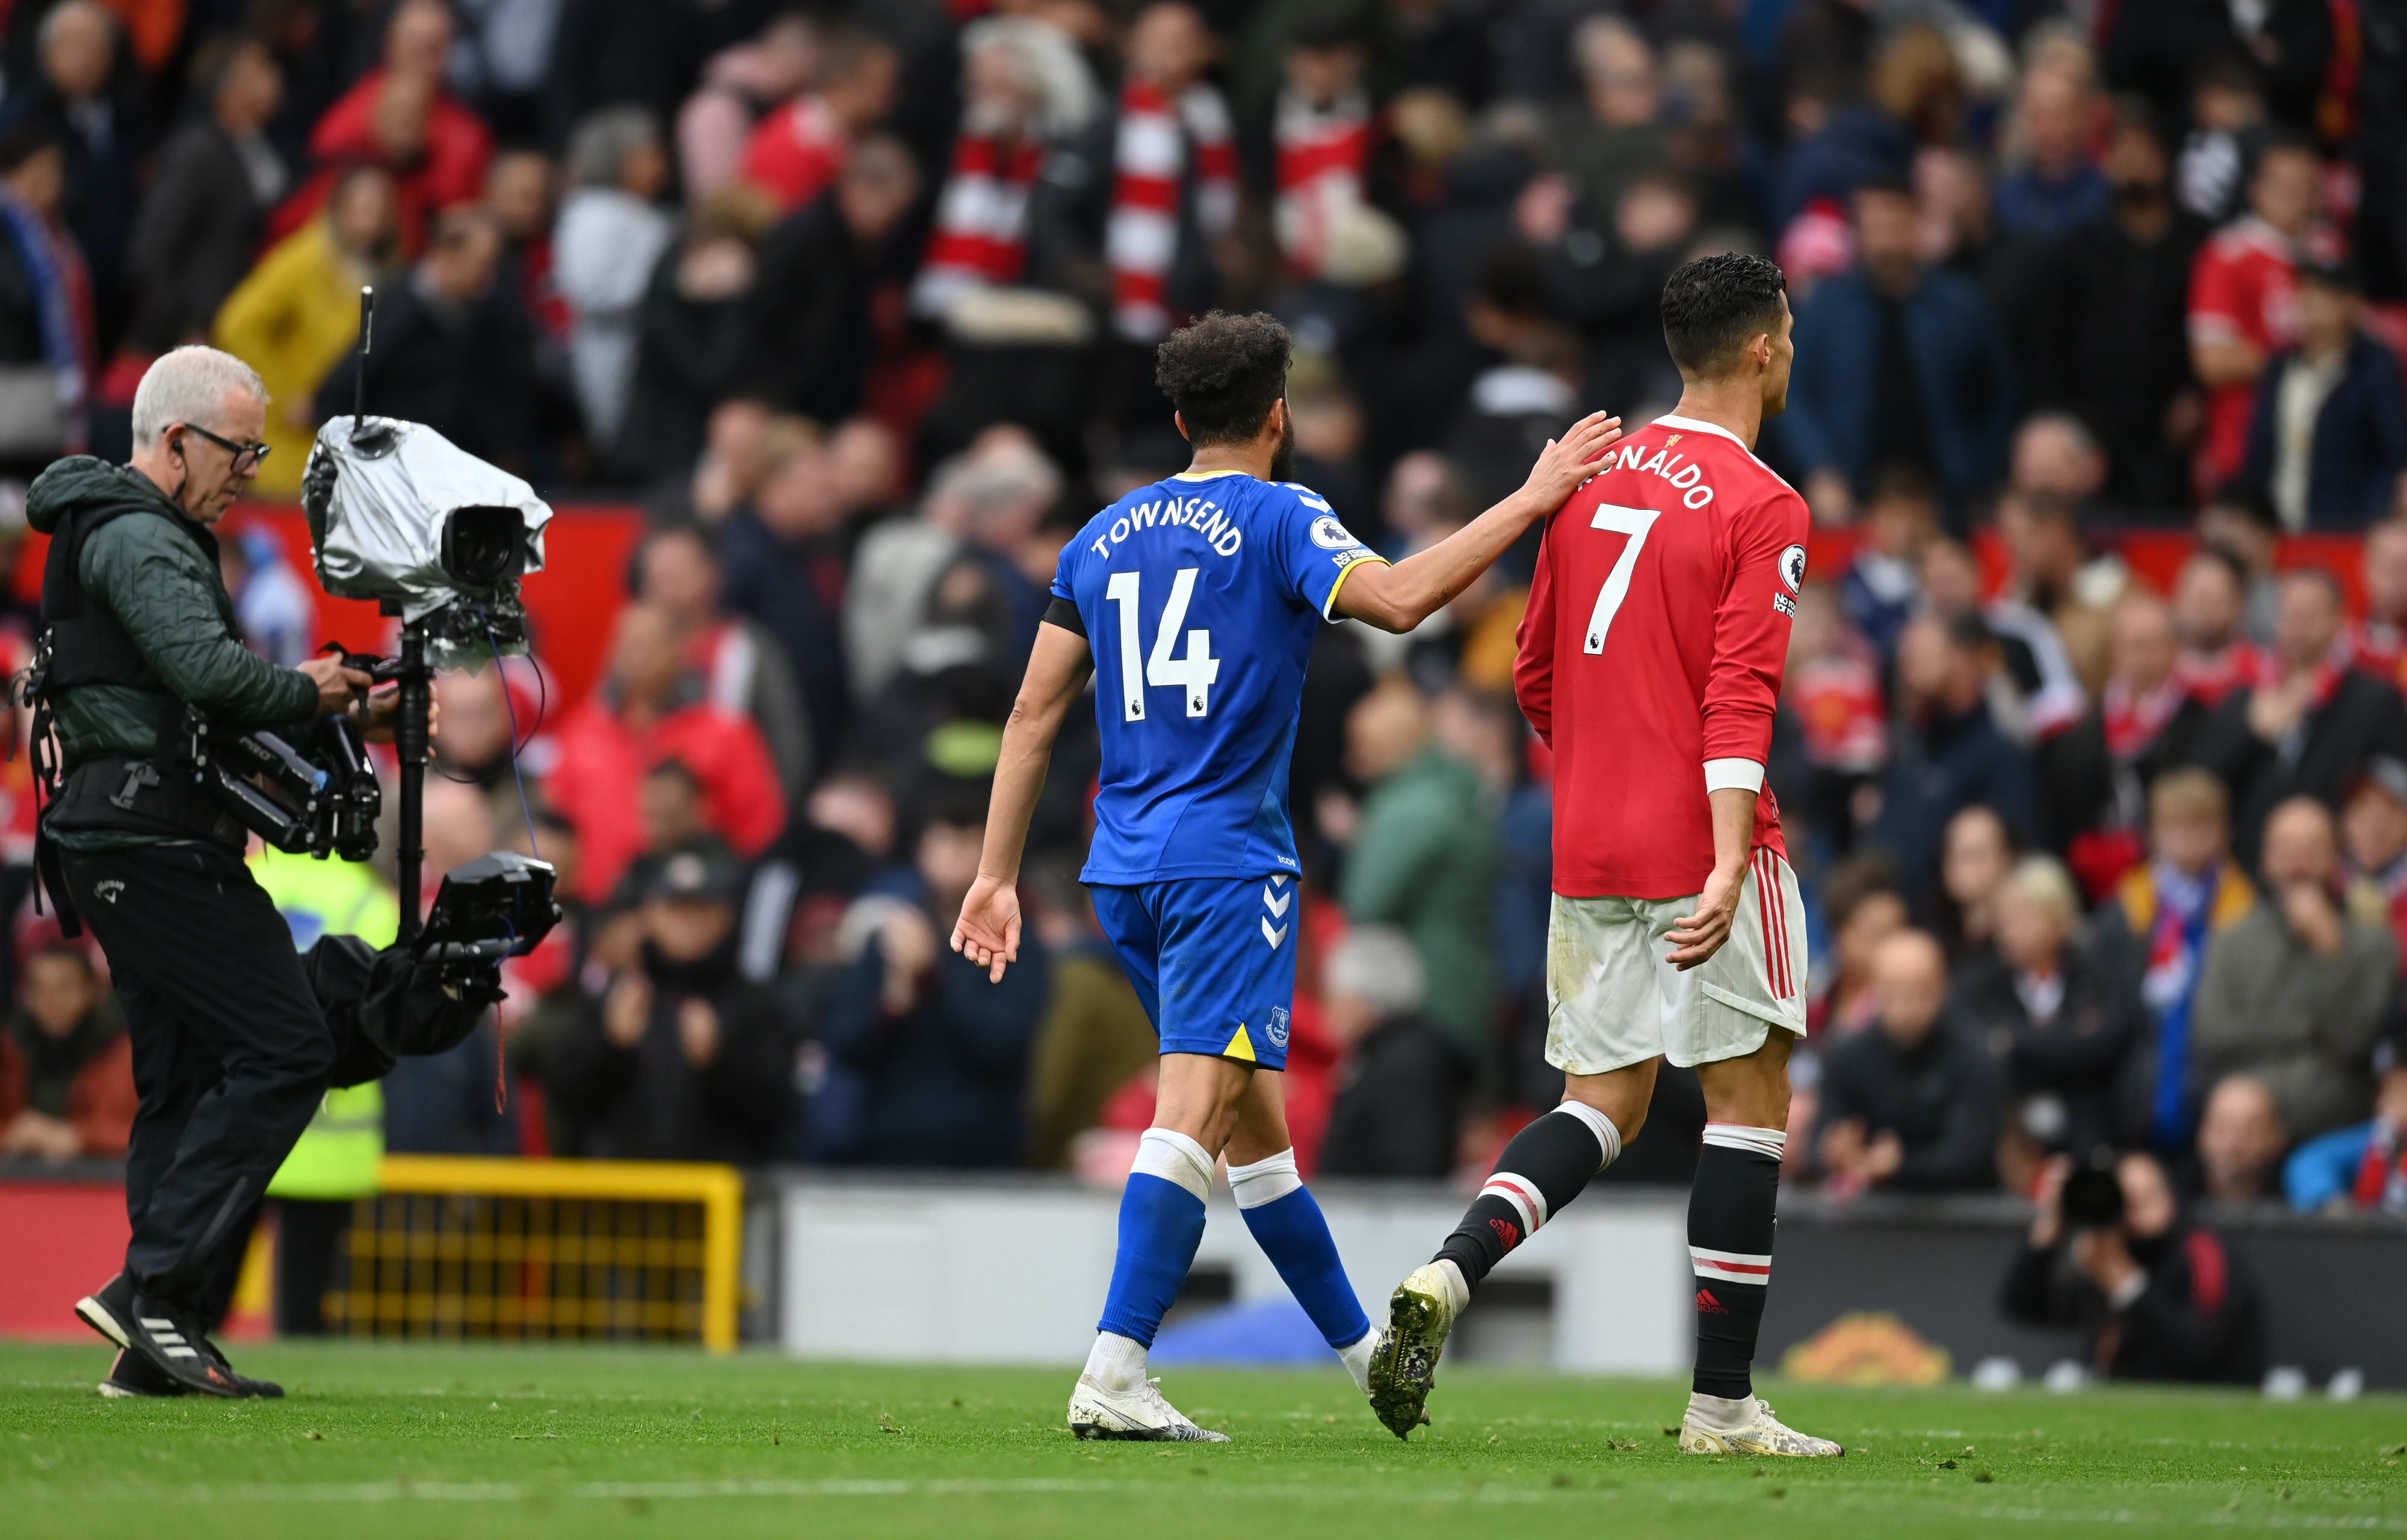 Everton player Andy Townsend hugs Manchester United striker Cristiano Ronaldo